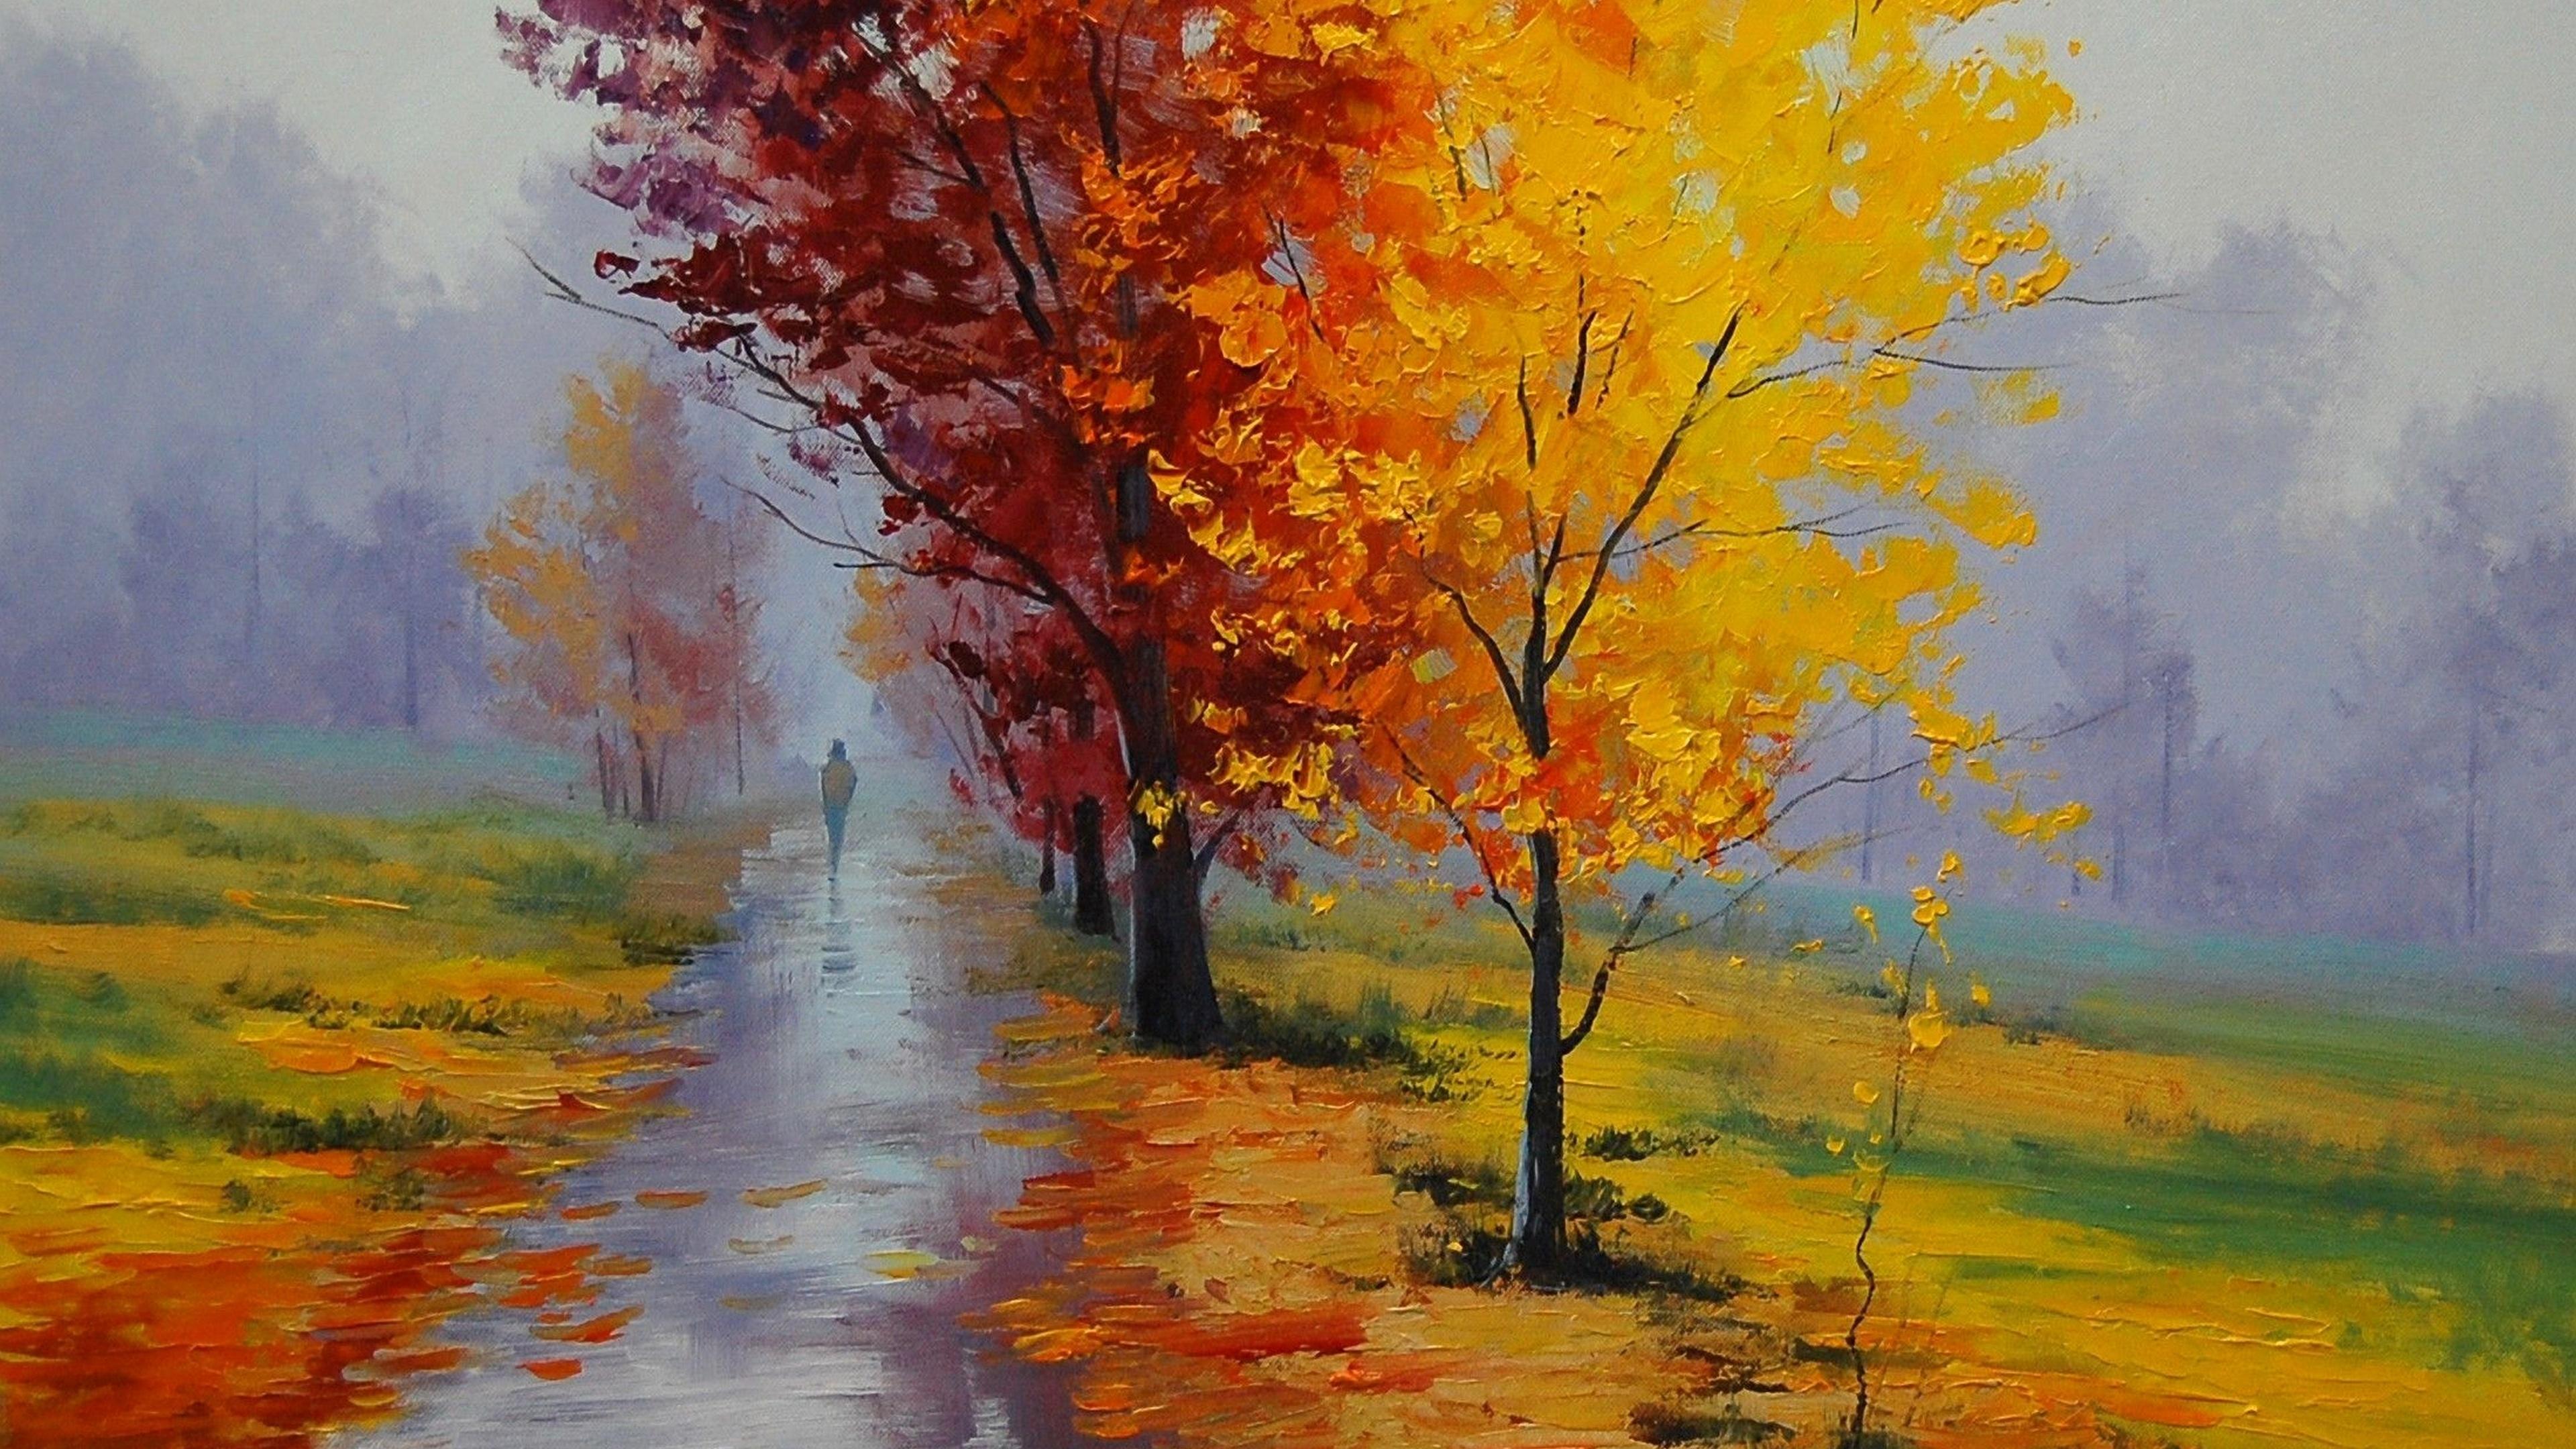 Fall Art wallpaper hd